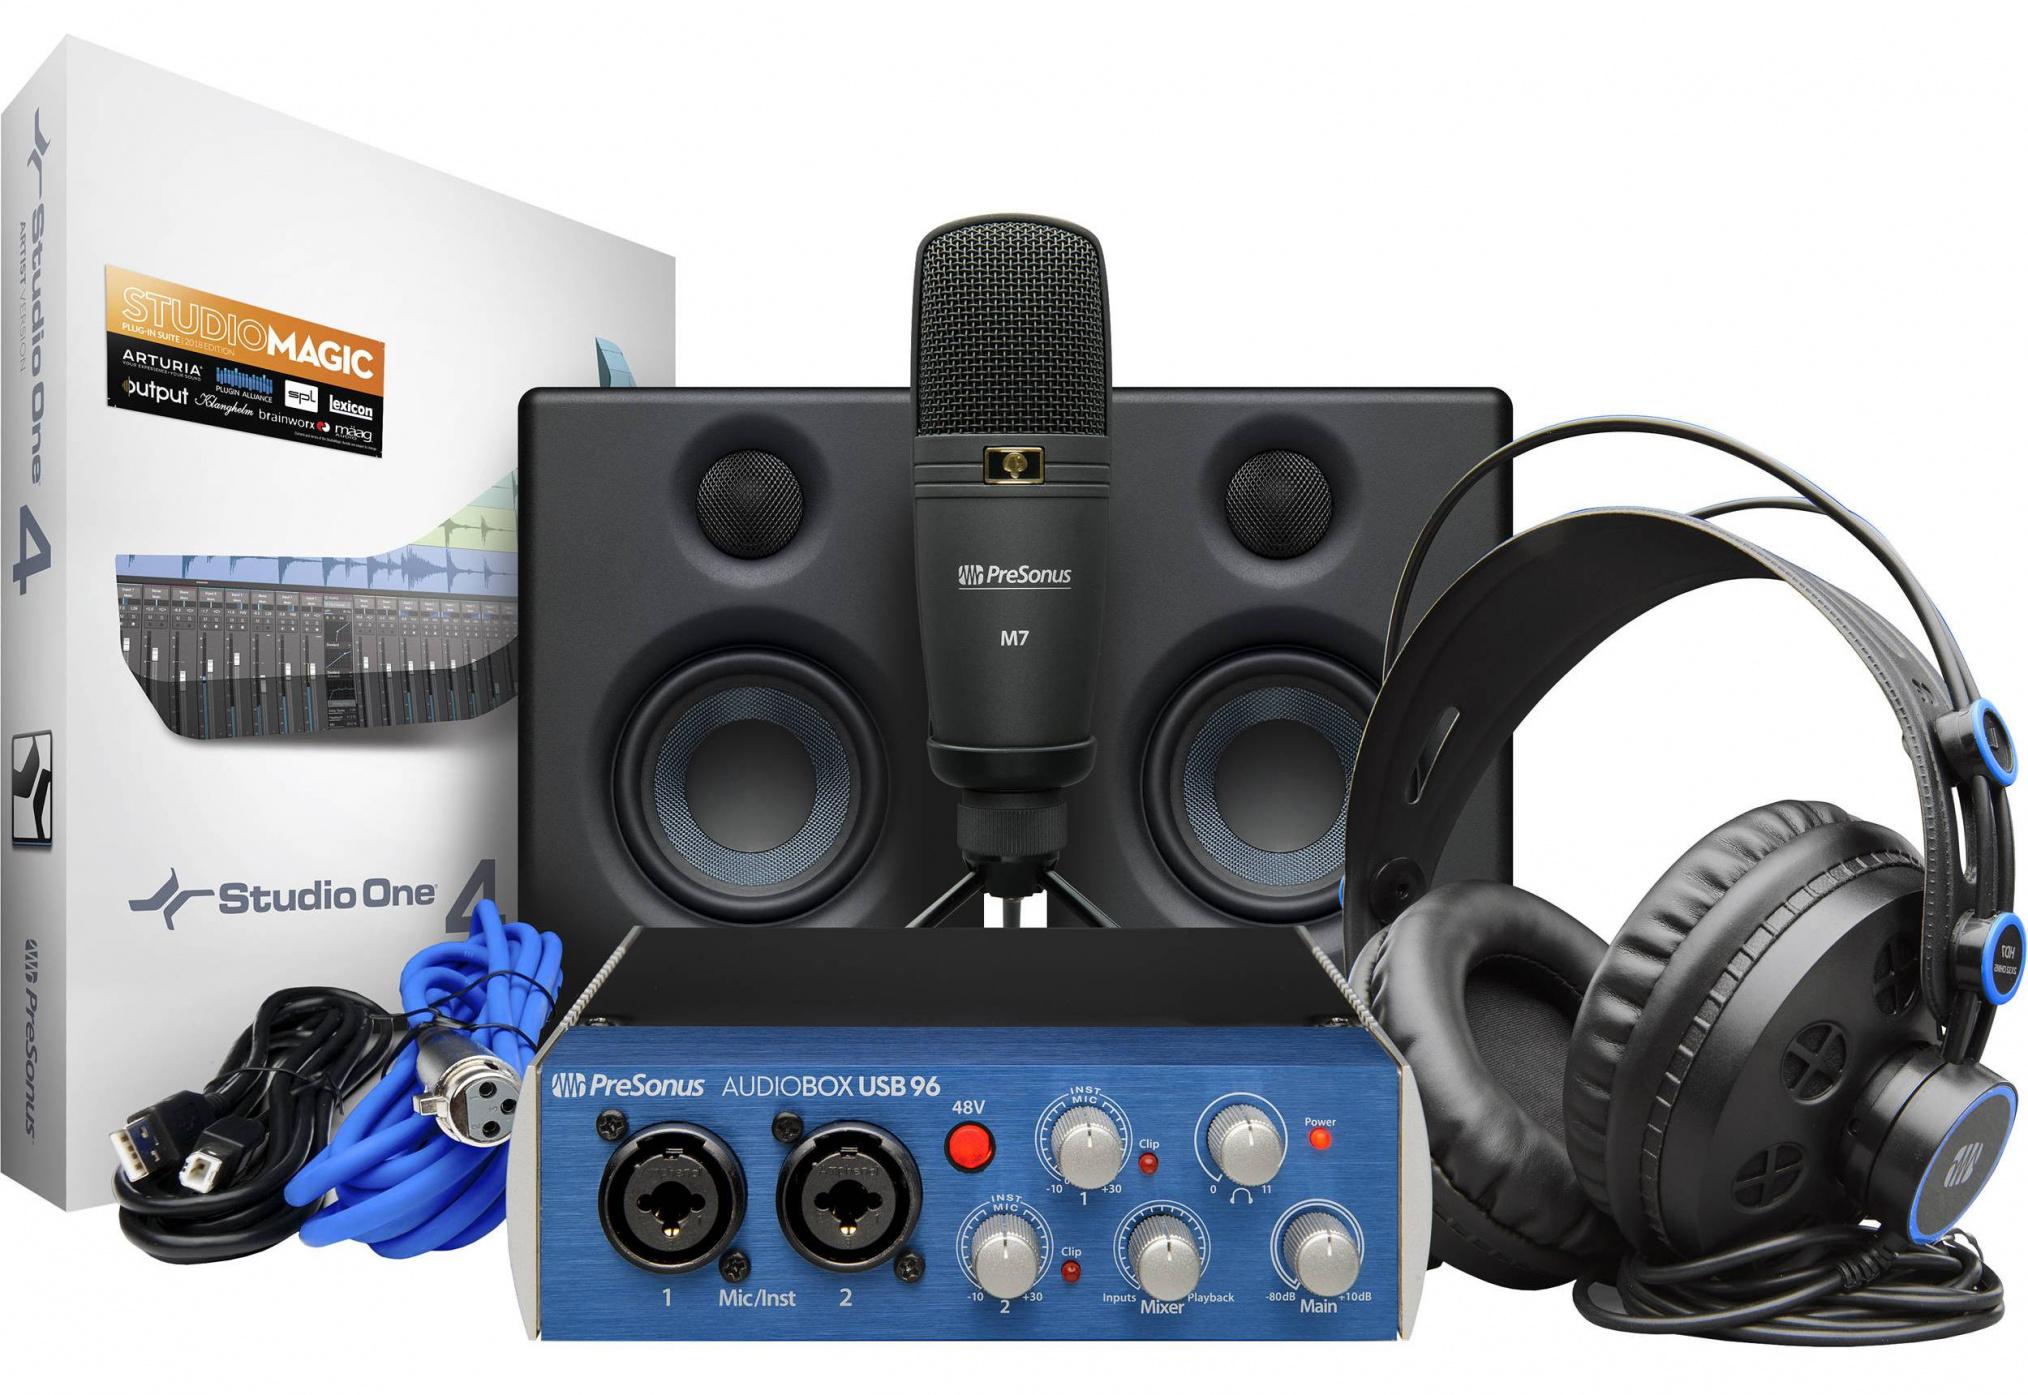 presonus_abox96k_ultimate_audiobox_studio_ultimate_bundle_1420742.jpg